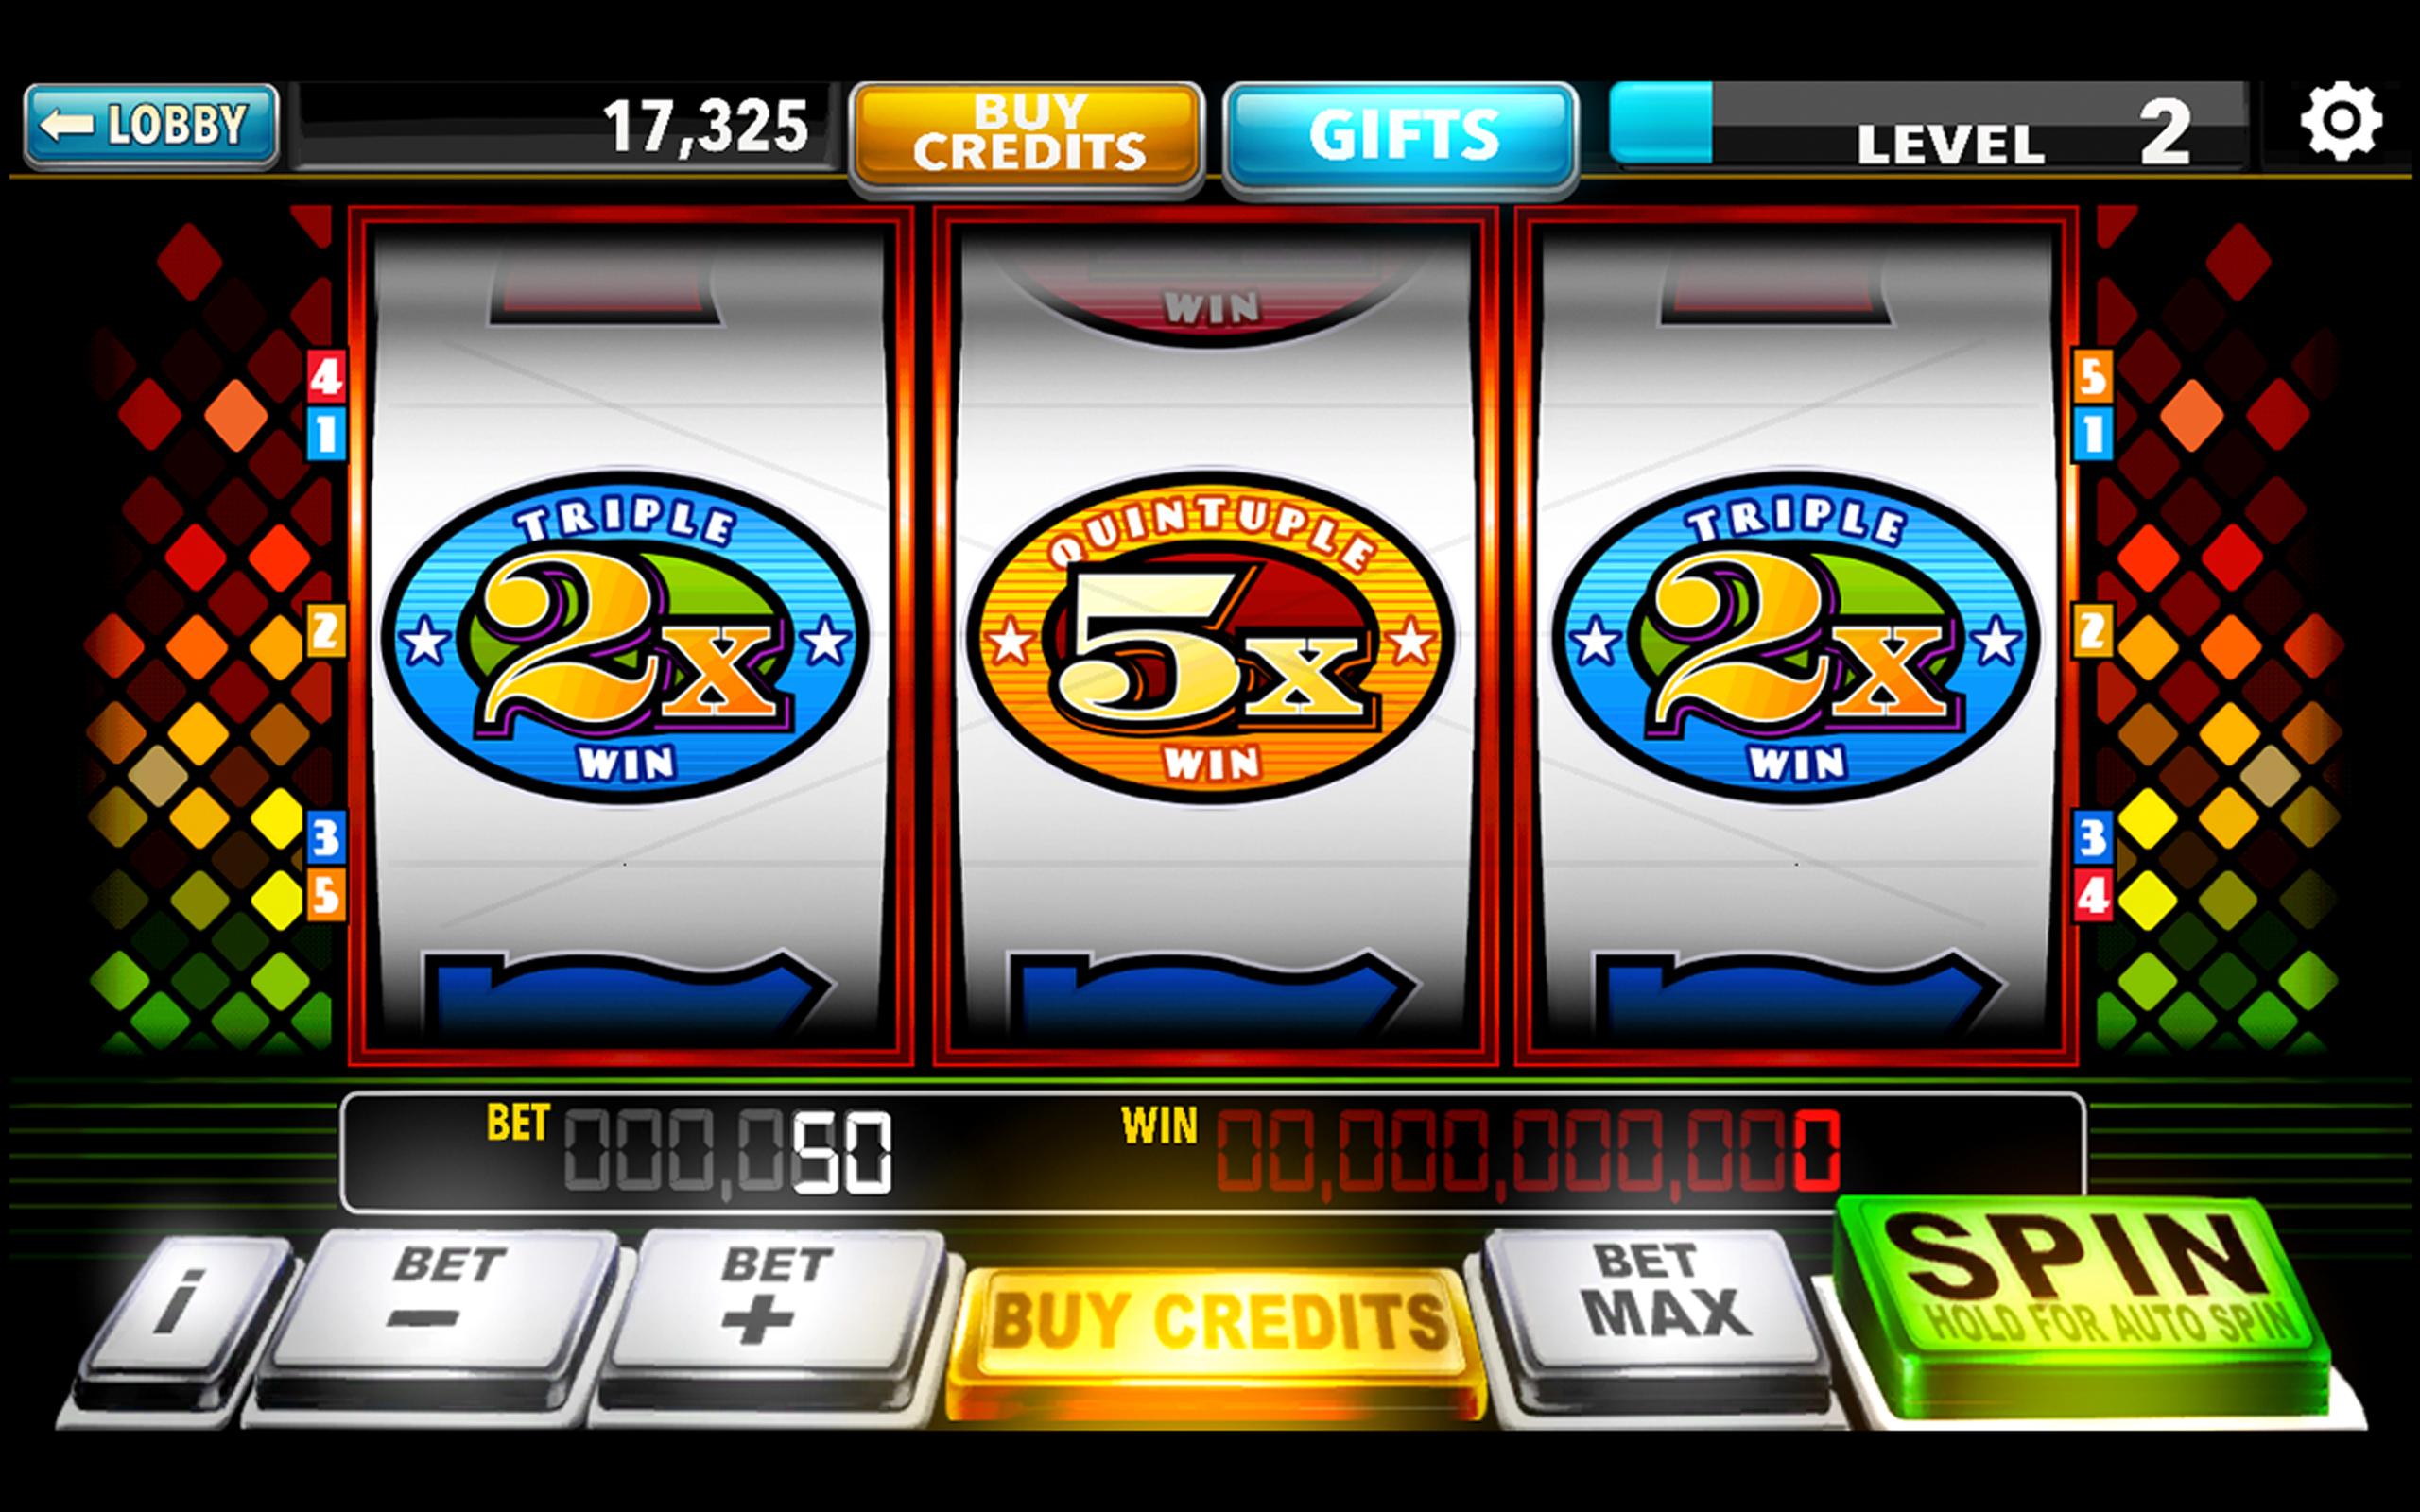 Slots vegas casino free coins paysafecard por - 15020